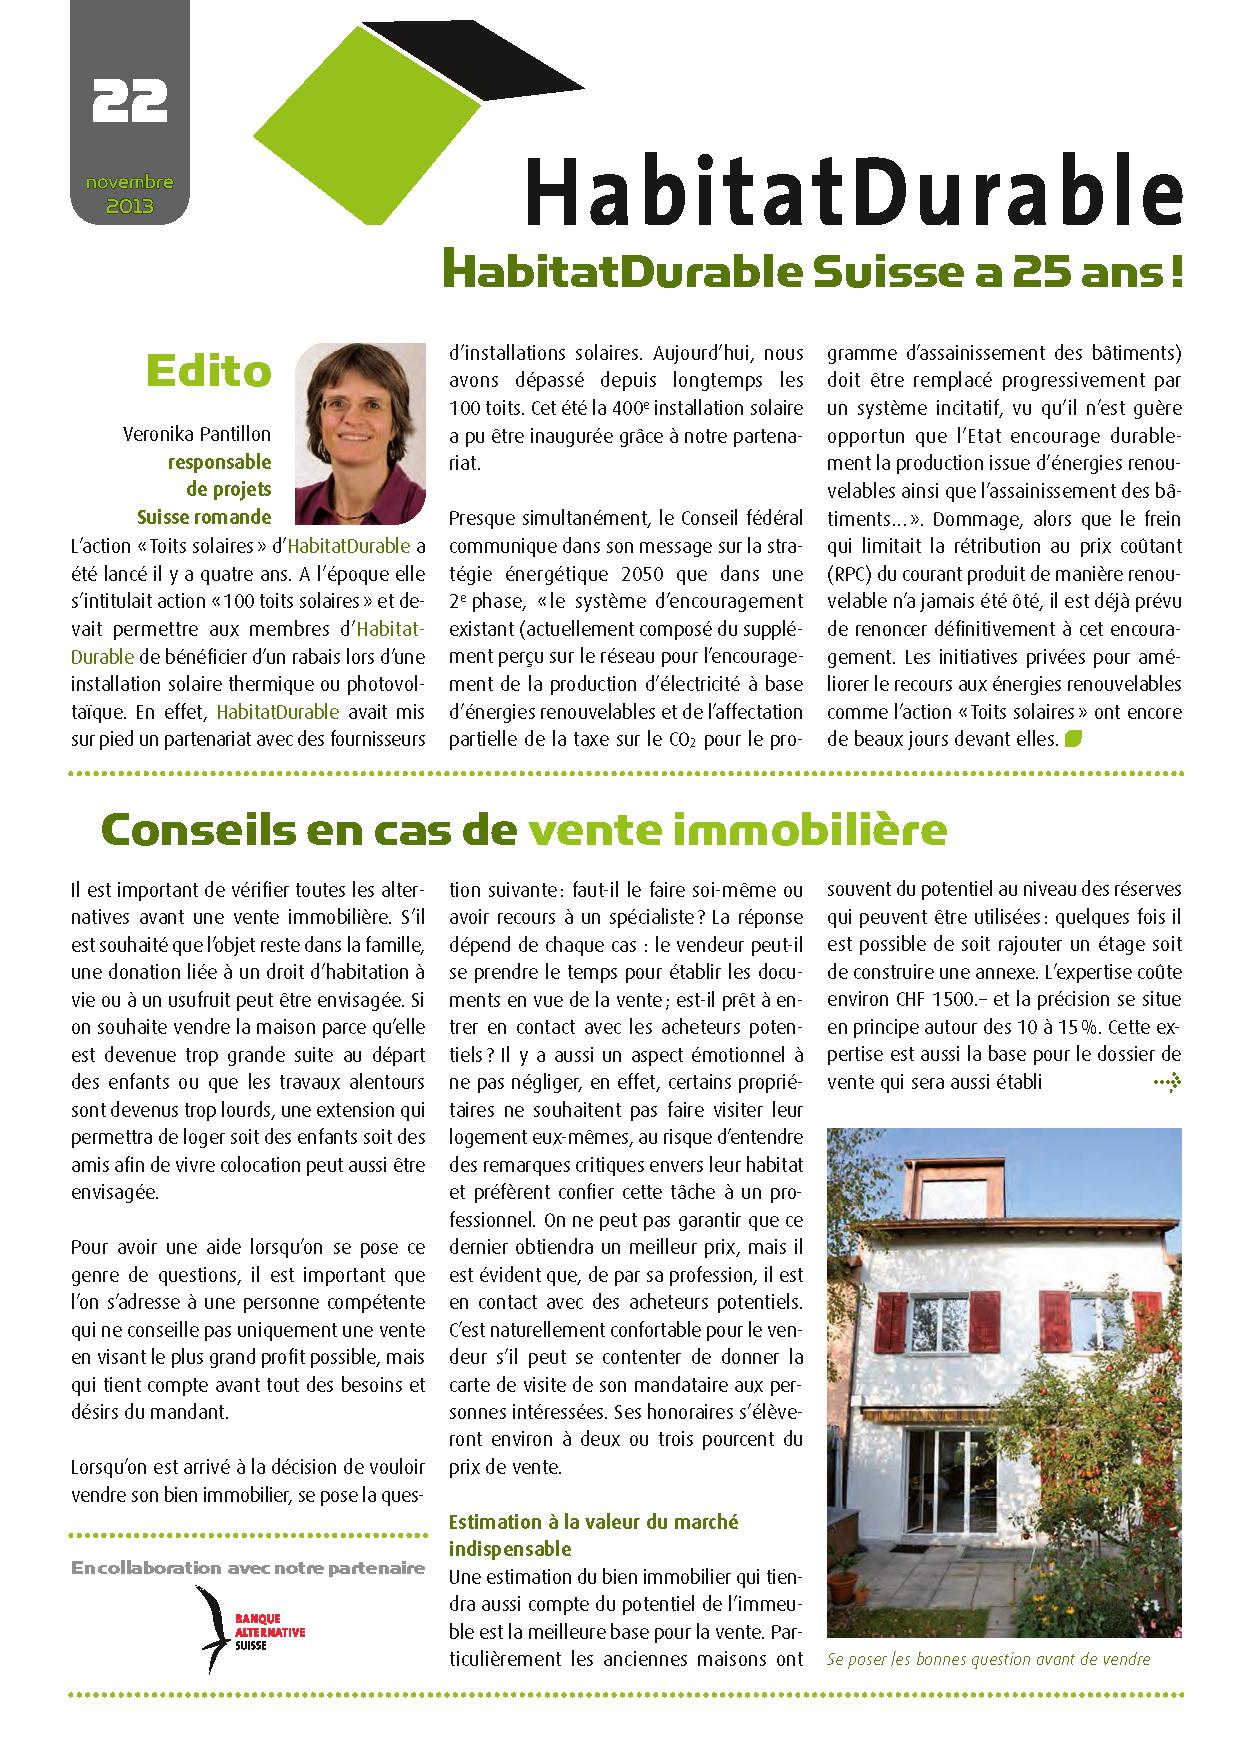 HabitatDurable 22 | novembre 2013